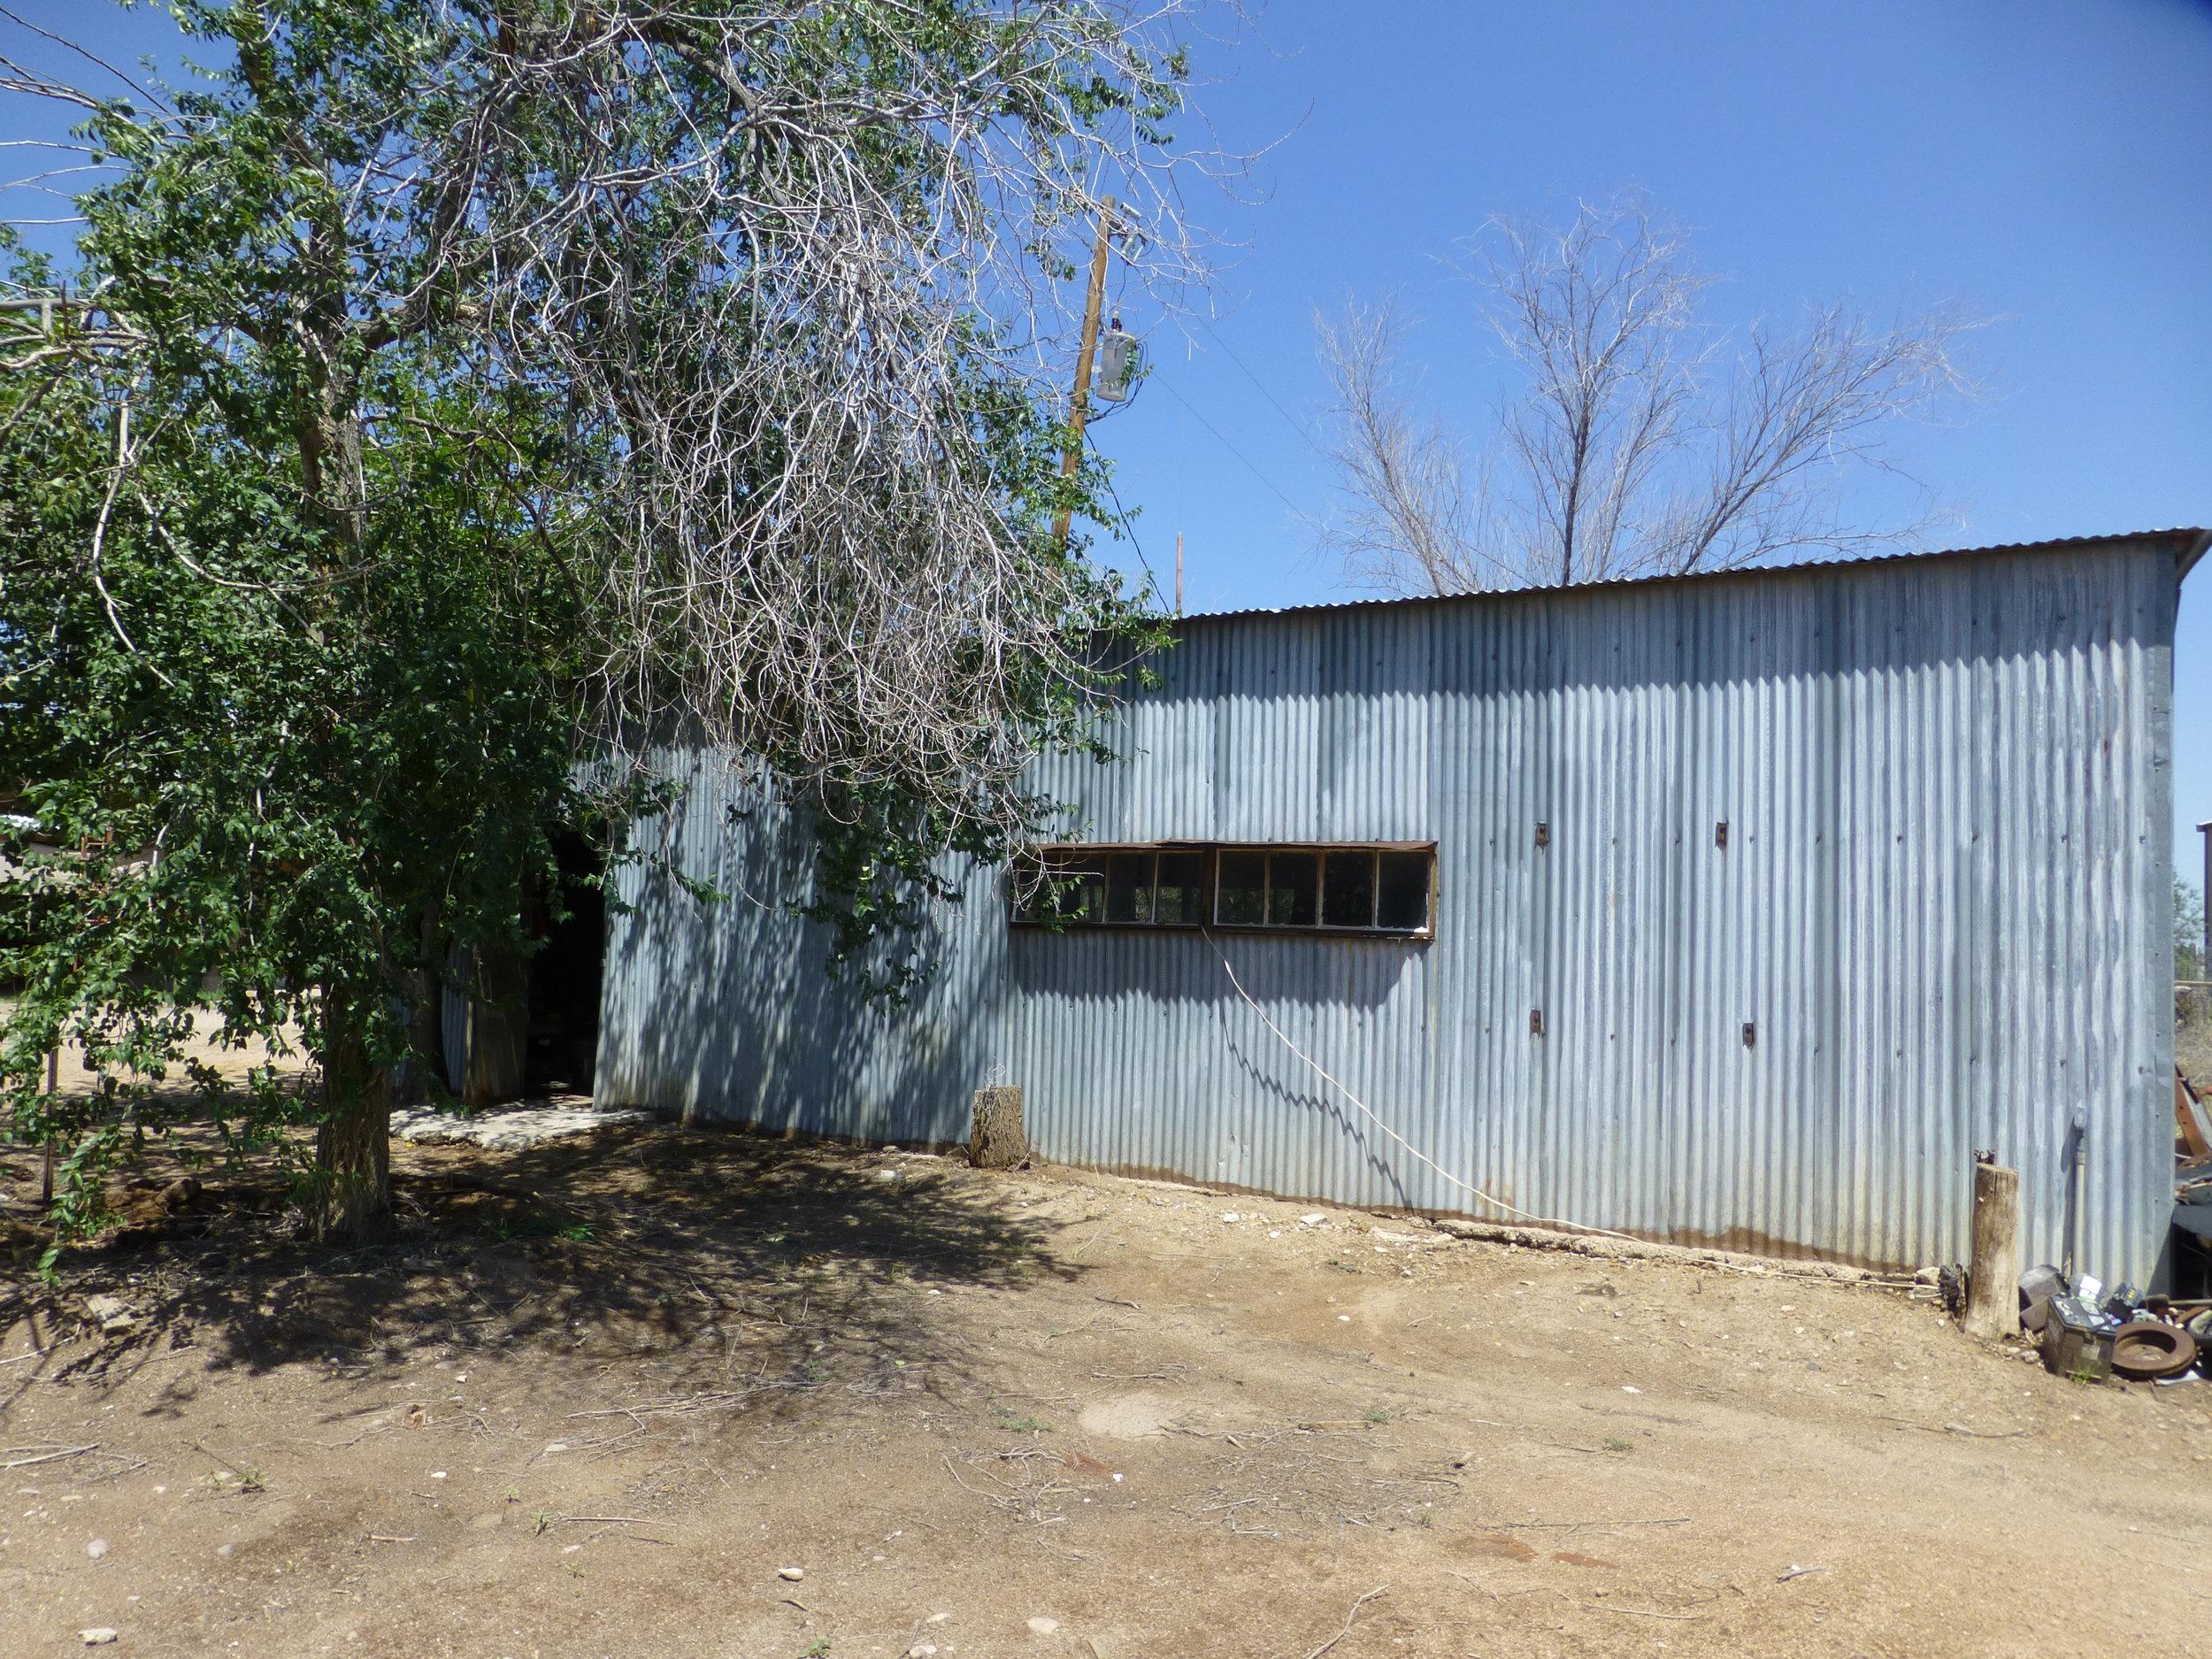 Equipment shed - Copy - Copy.JPG